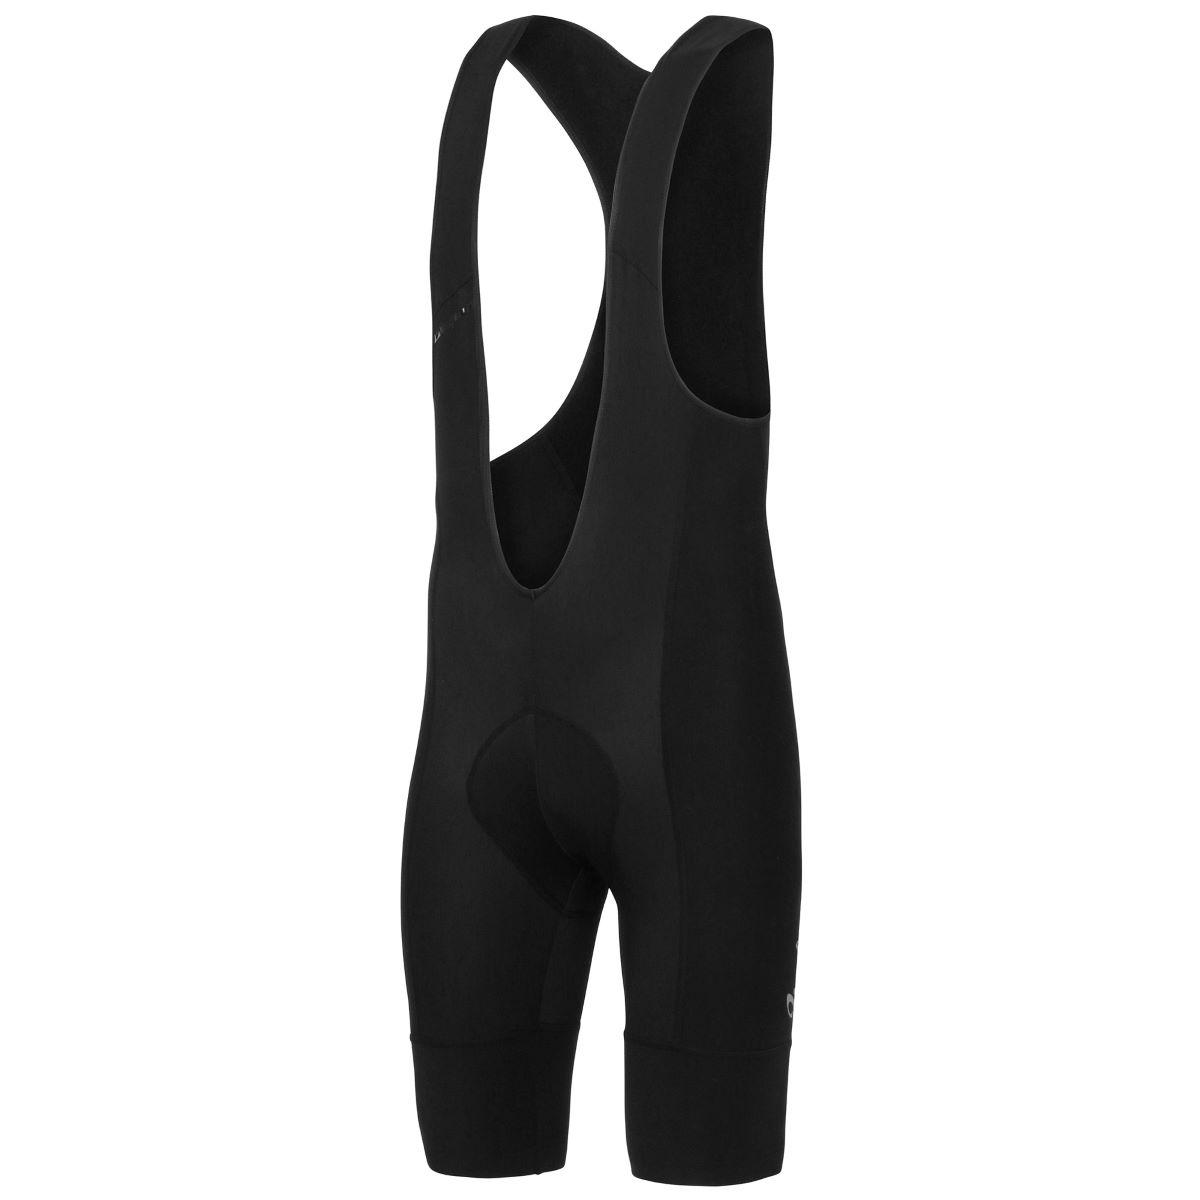 Isadore Thermo Roubaix Bib Shorts - Extra Large Black http://bikes.net.au/t/TLHk #bikepic.twitter.com/ikETib19eE